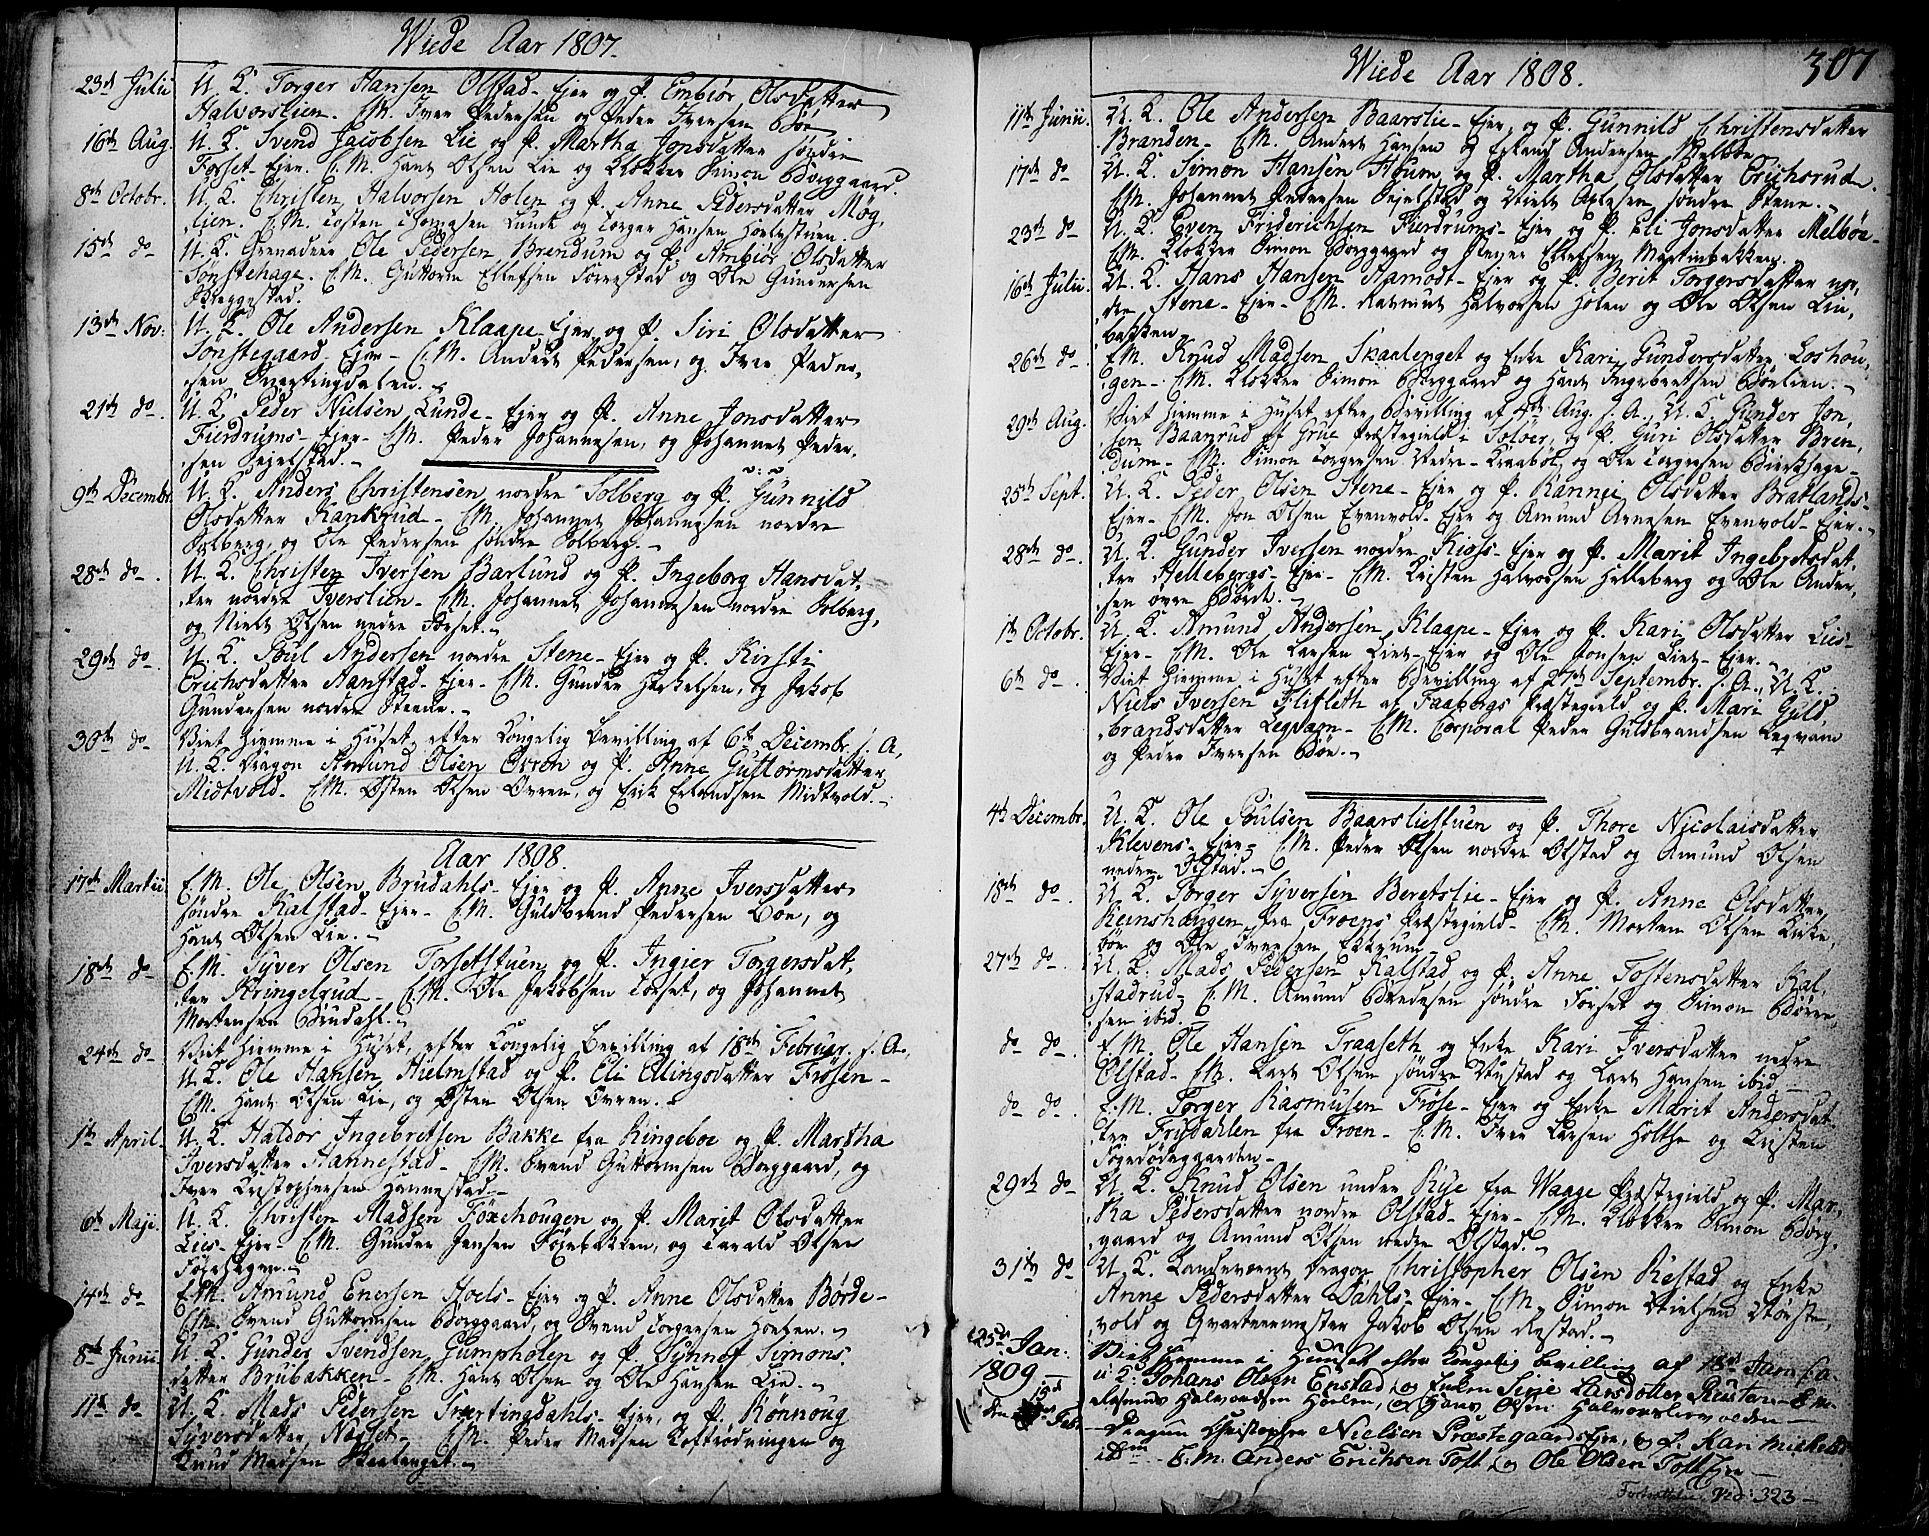 SAH, Gausdal prestekontor, Ministerialbok nr. 3, 1758-1809, s. 307